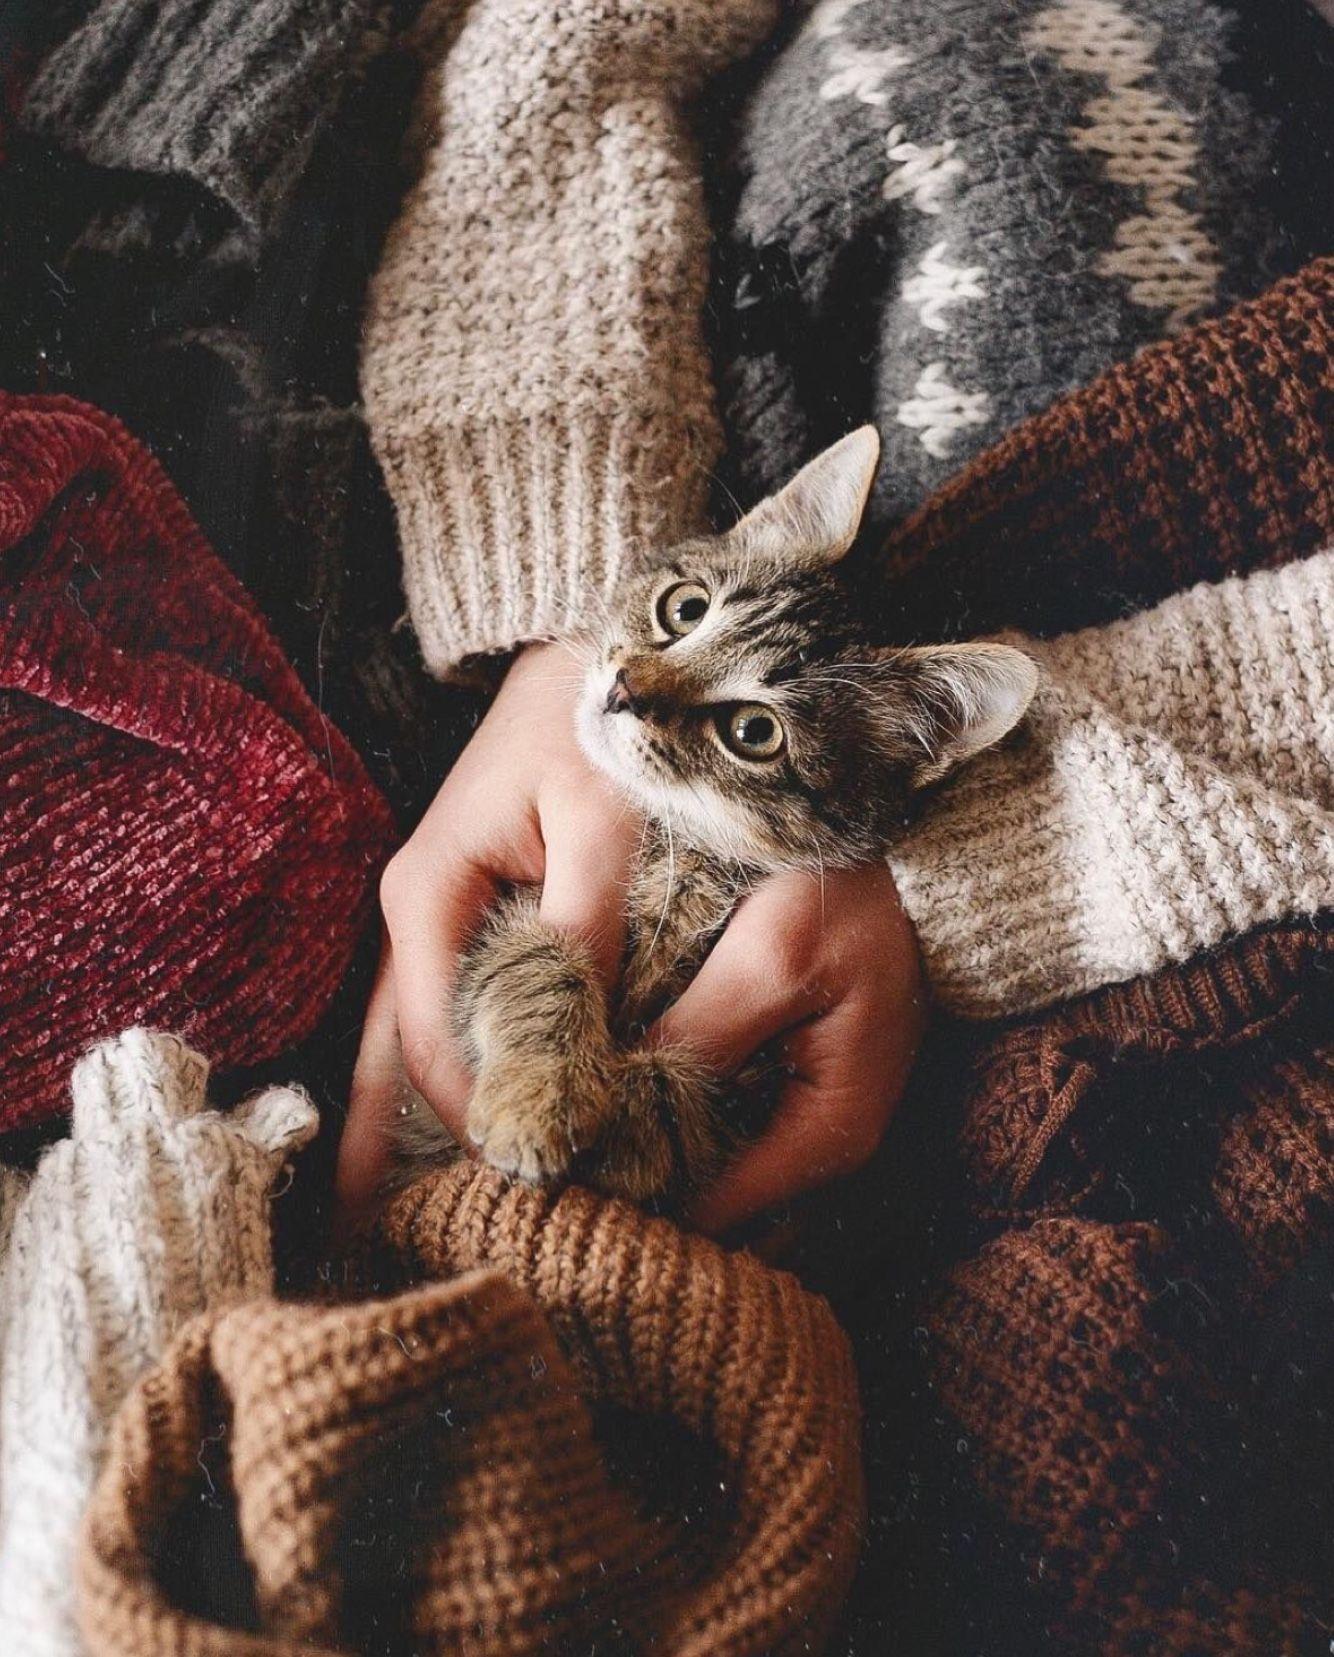 Pin By Aivija Gritane On K I T T E N Animals Cute Animals Cat Love